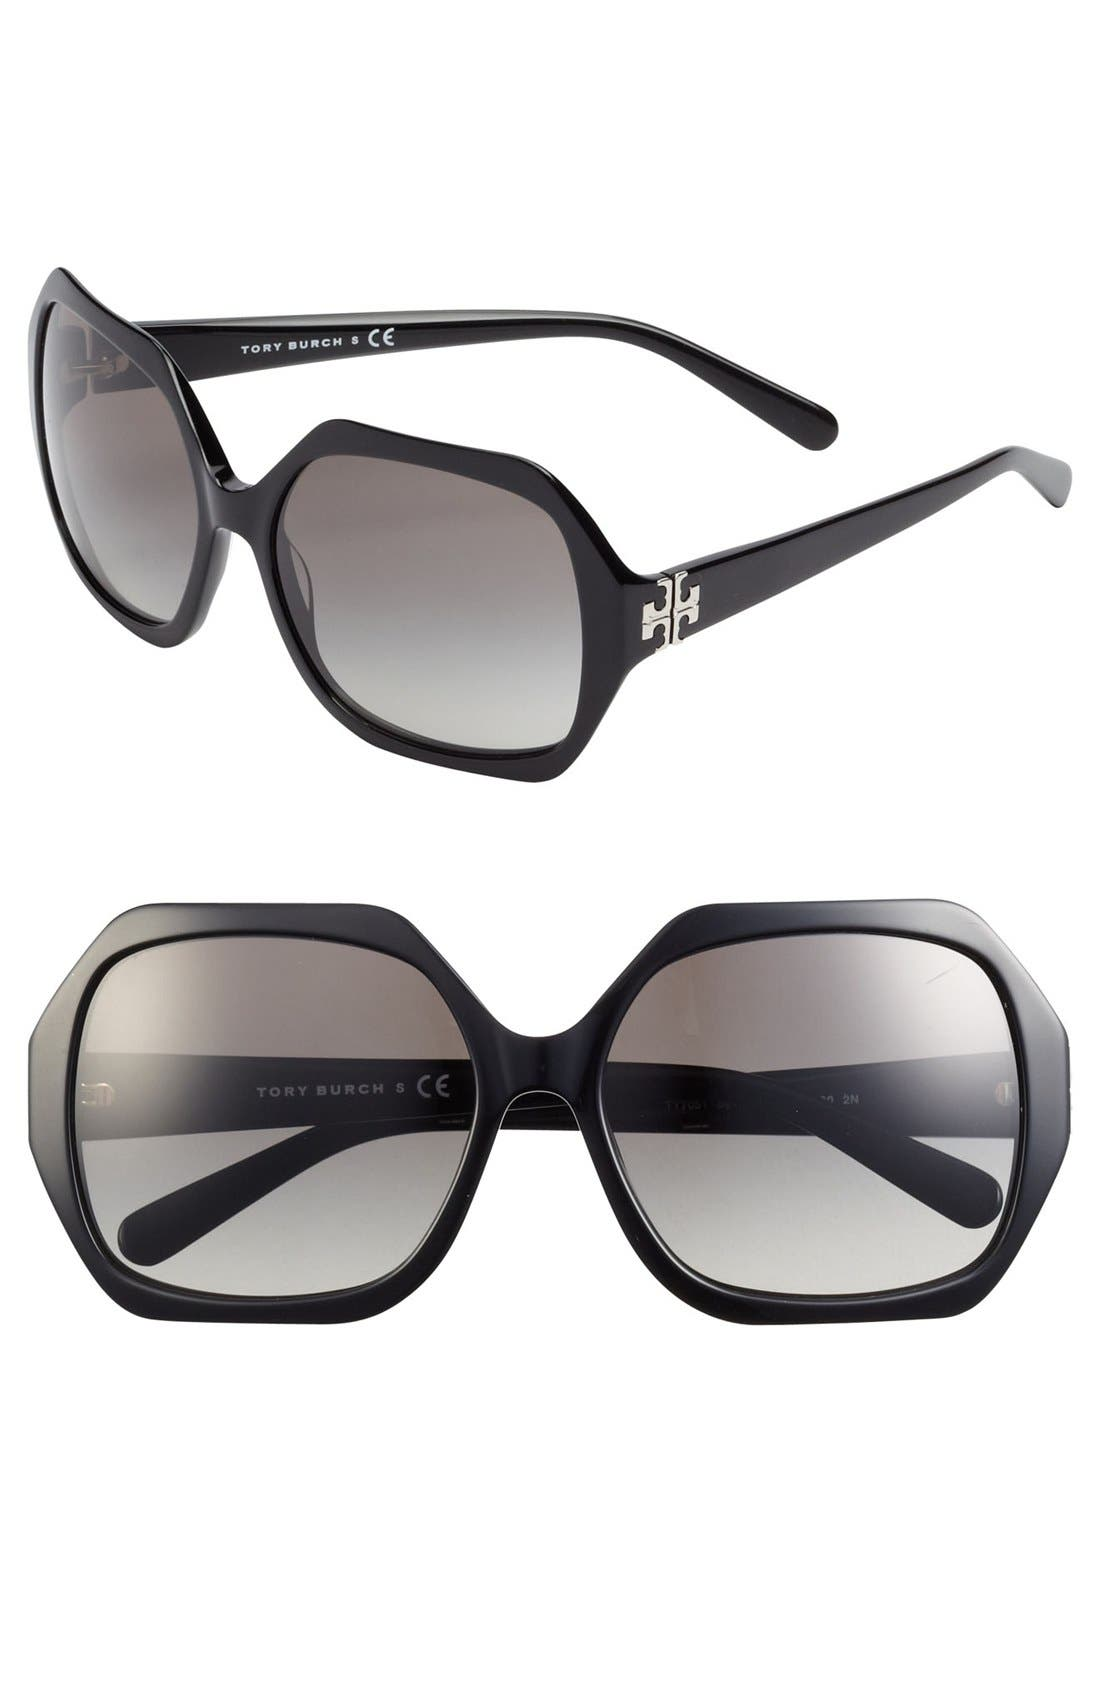 Main Image - Tory Burch 58mm Sunglasses